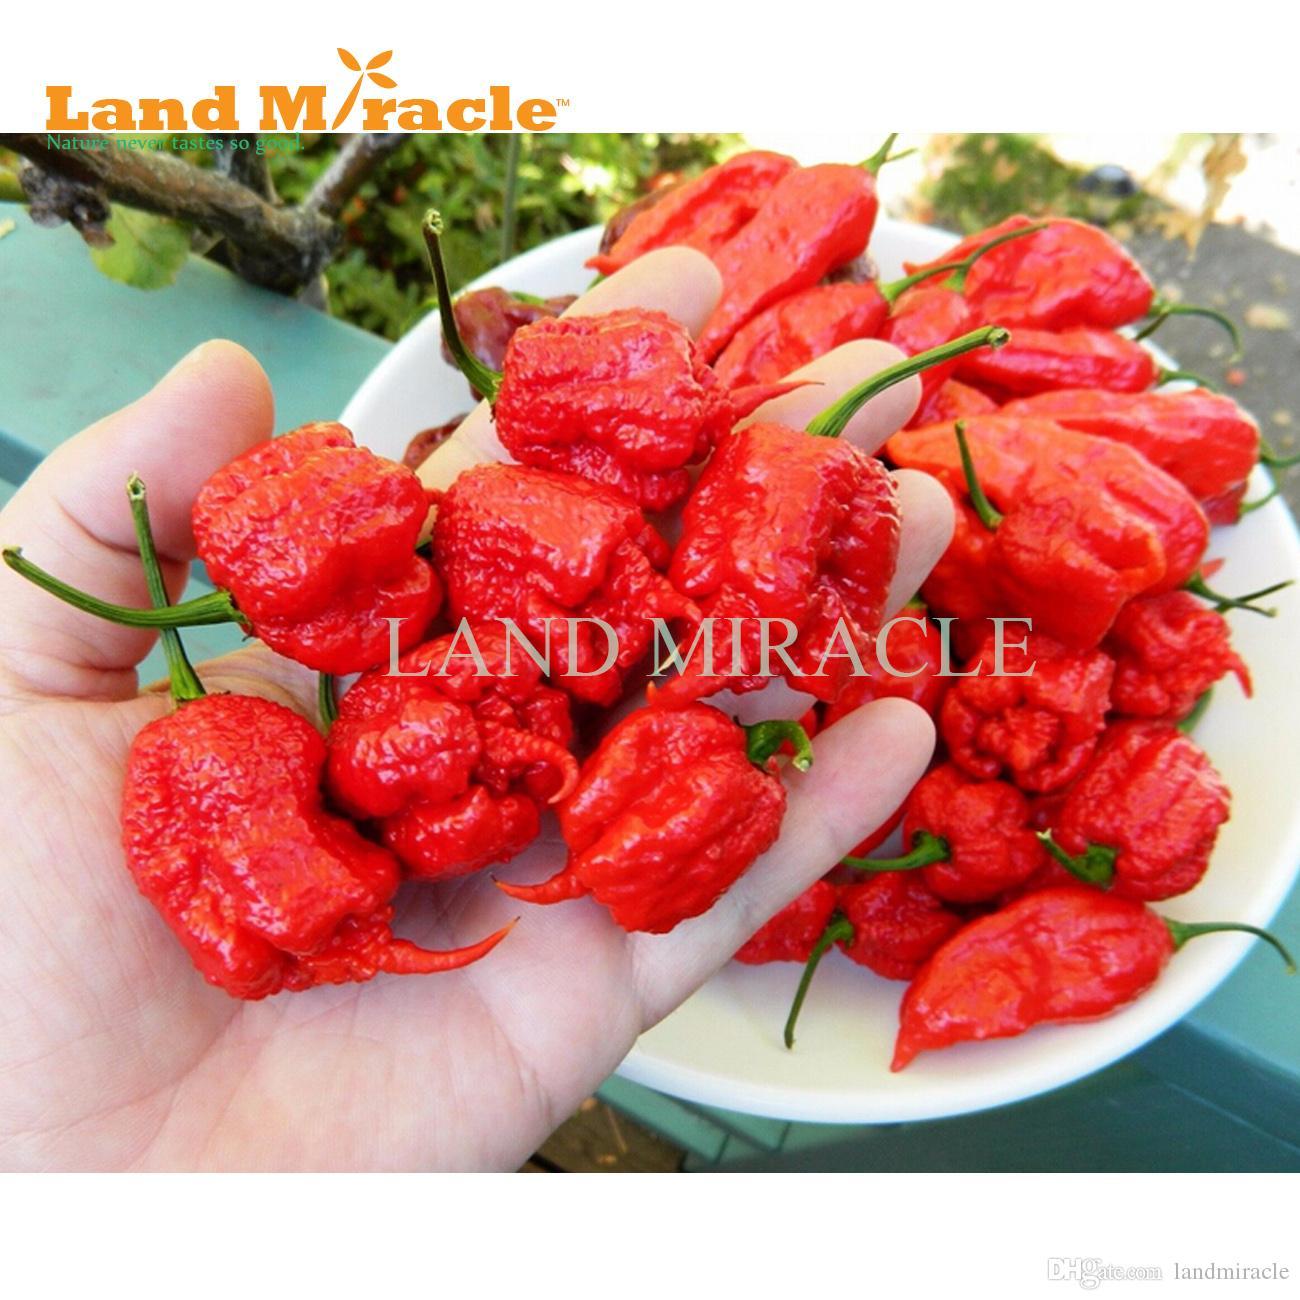 Nova variedade de sementes de malagueta, 100 sementes, Trinidad Scorpion MORUGA pimenta sementes * pimenta mais quente do mundo *